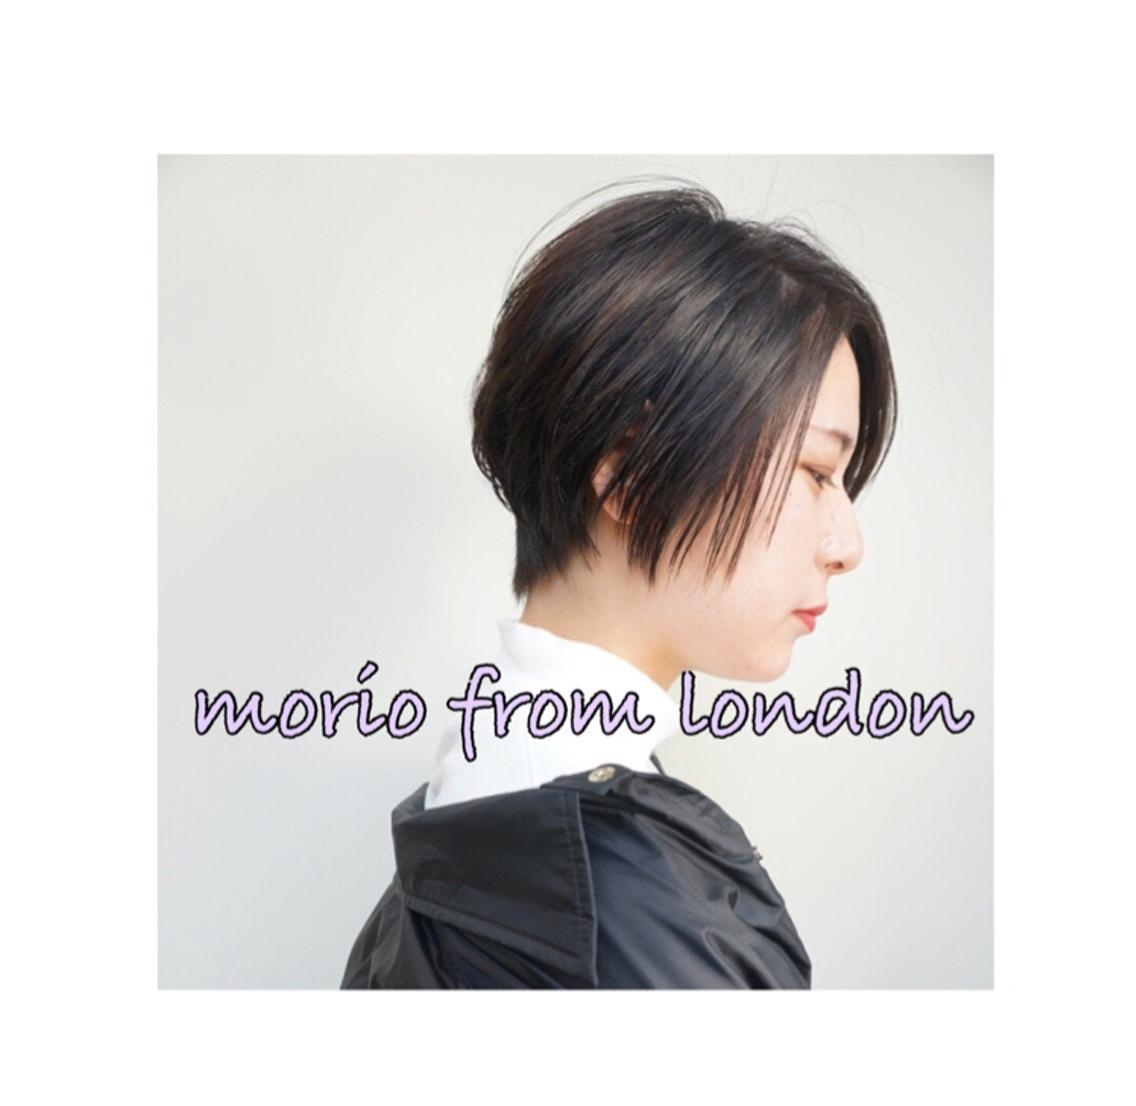 ‼️勉強会モデル募集‼️⭐︎MORIO FROM LONDON ⭐︎〔モリオ フロム ロンドン〕鹿倉由貴